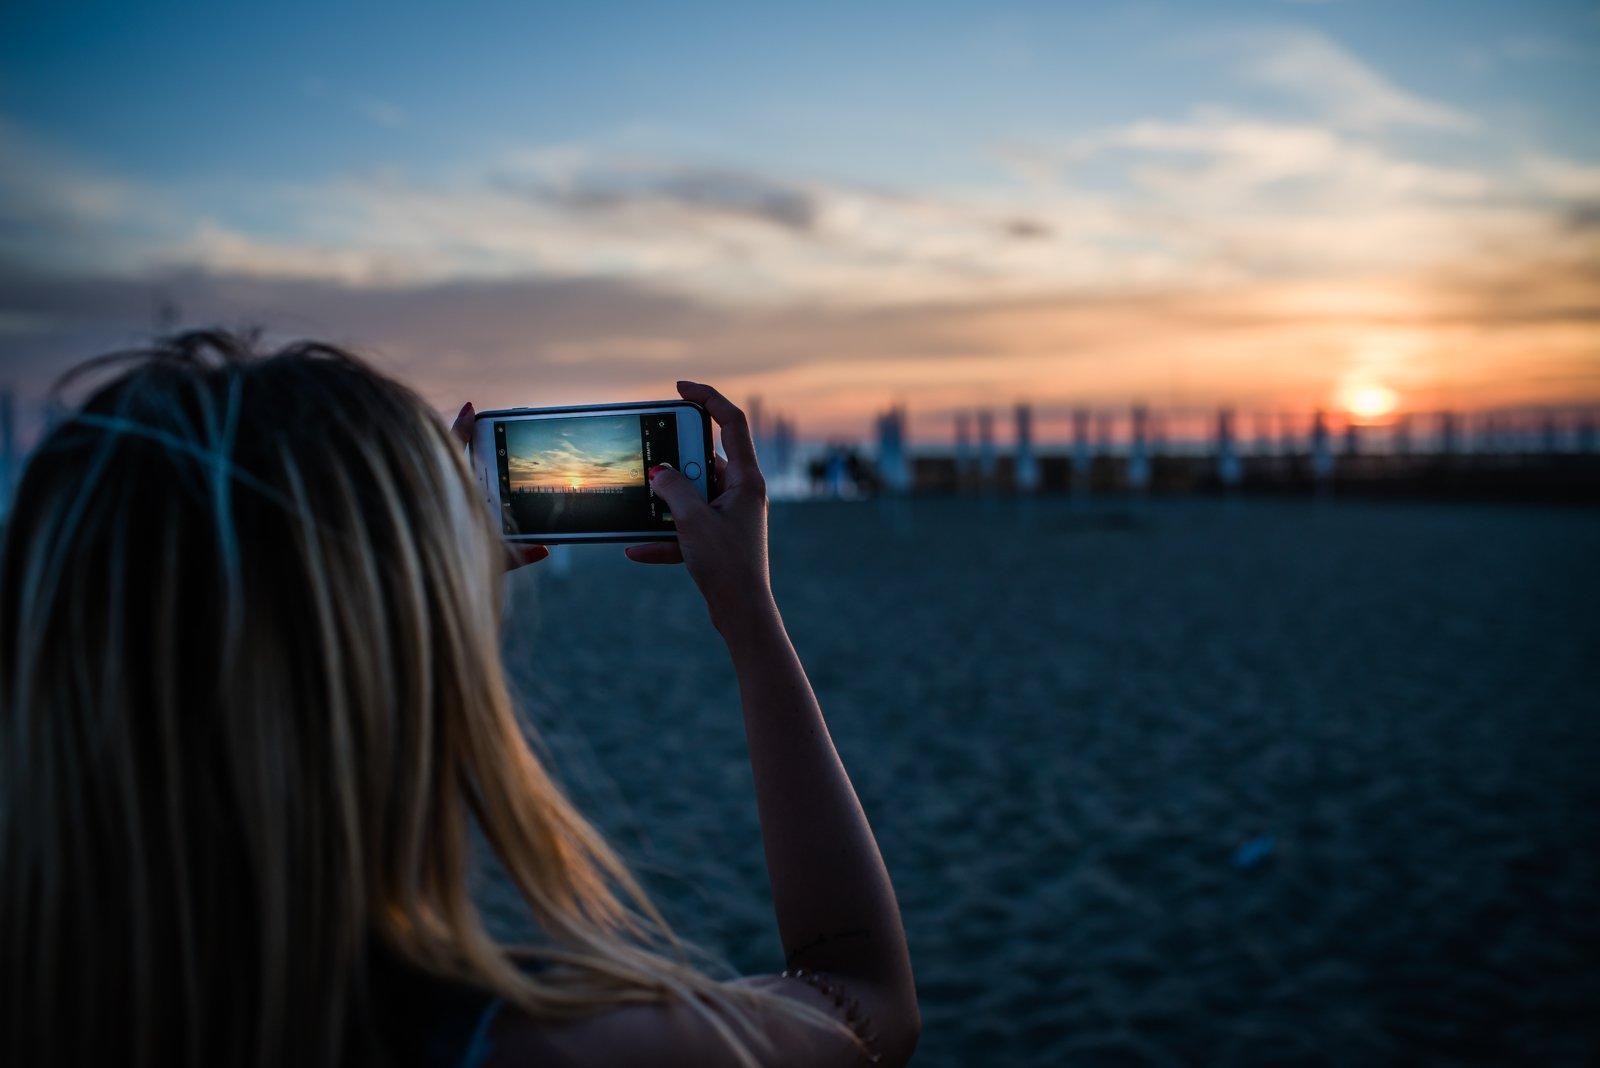 Sunset 4US Beach Party